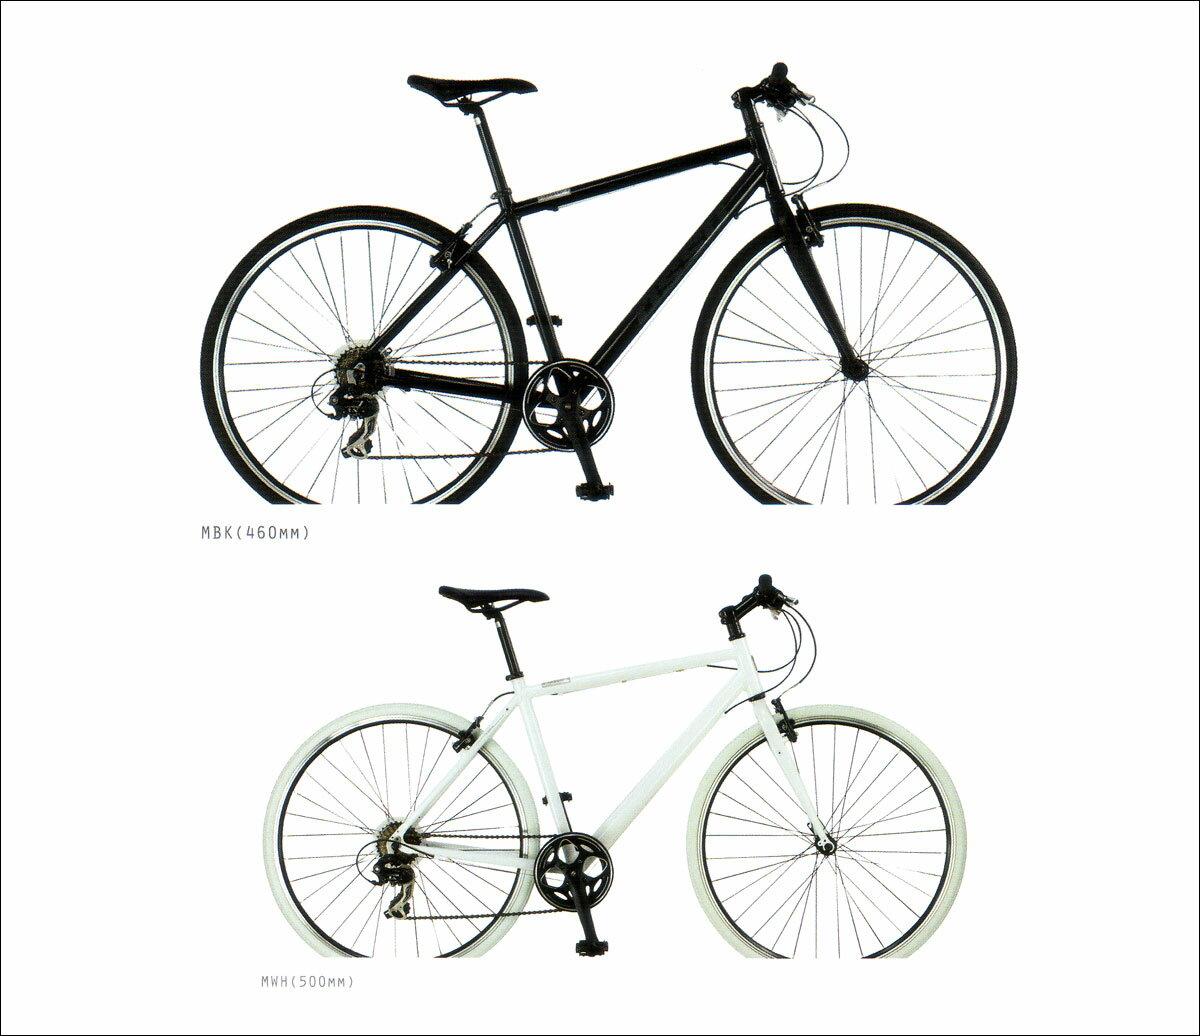 OSSO(オッソ) V310-AL【クロスバイク】【運動/健康/美容】 OSSO(オッソ) V310-AL【クロスバイク】